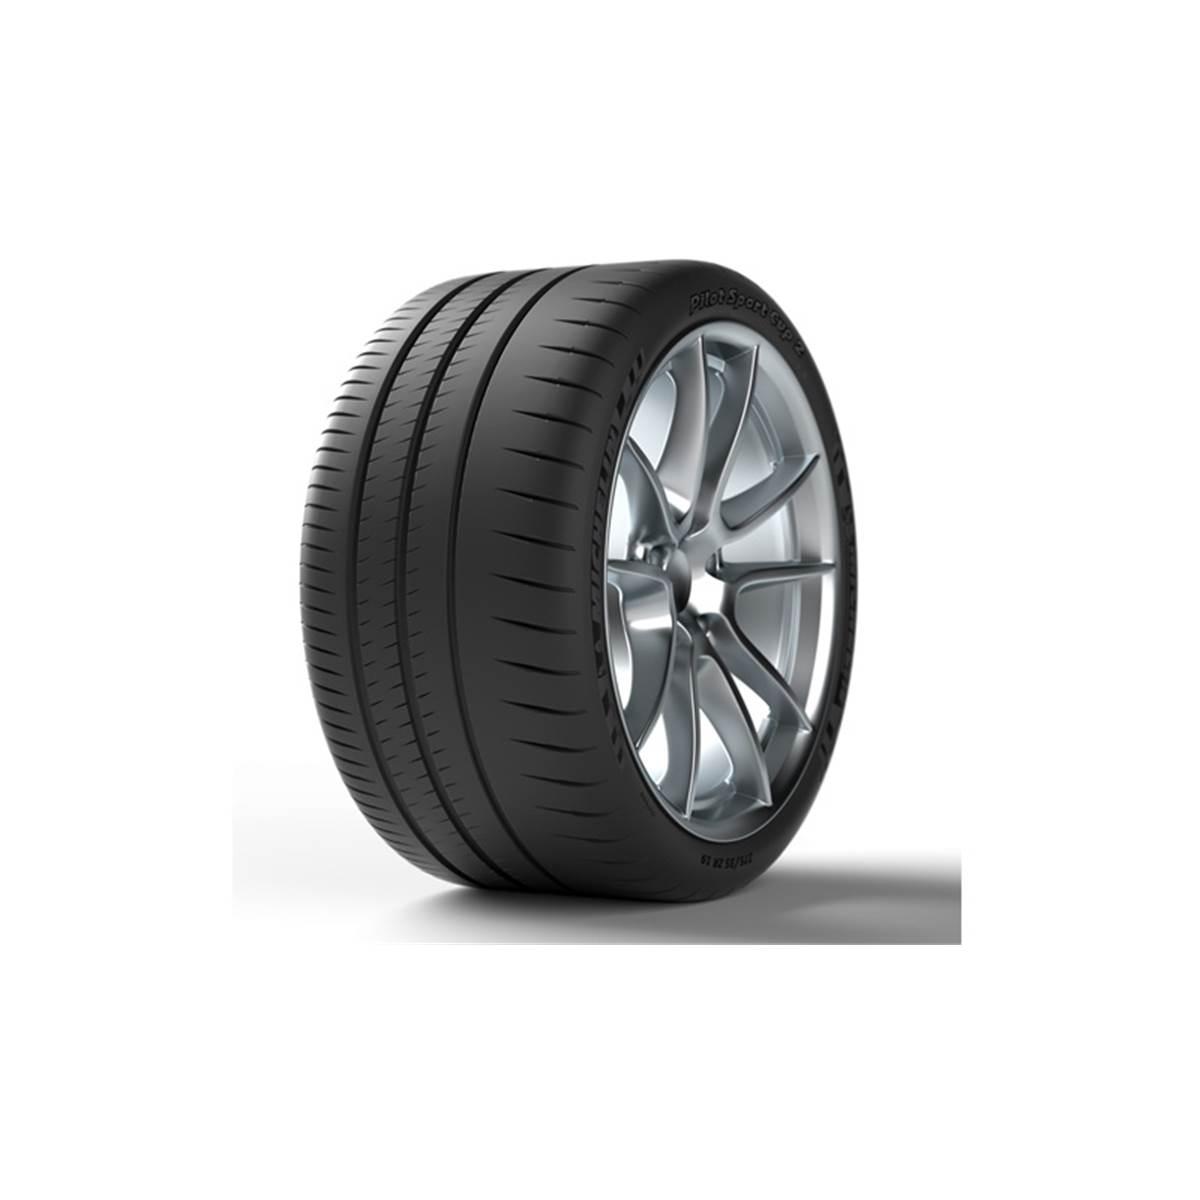 Pneu Michelin 325/30R21 104Y Pilot Sport Cup 2